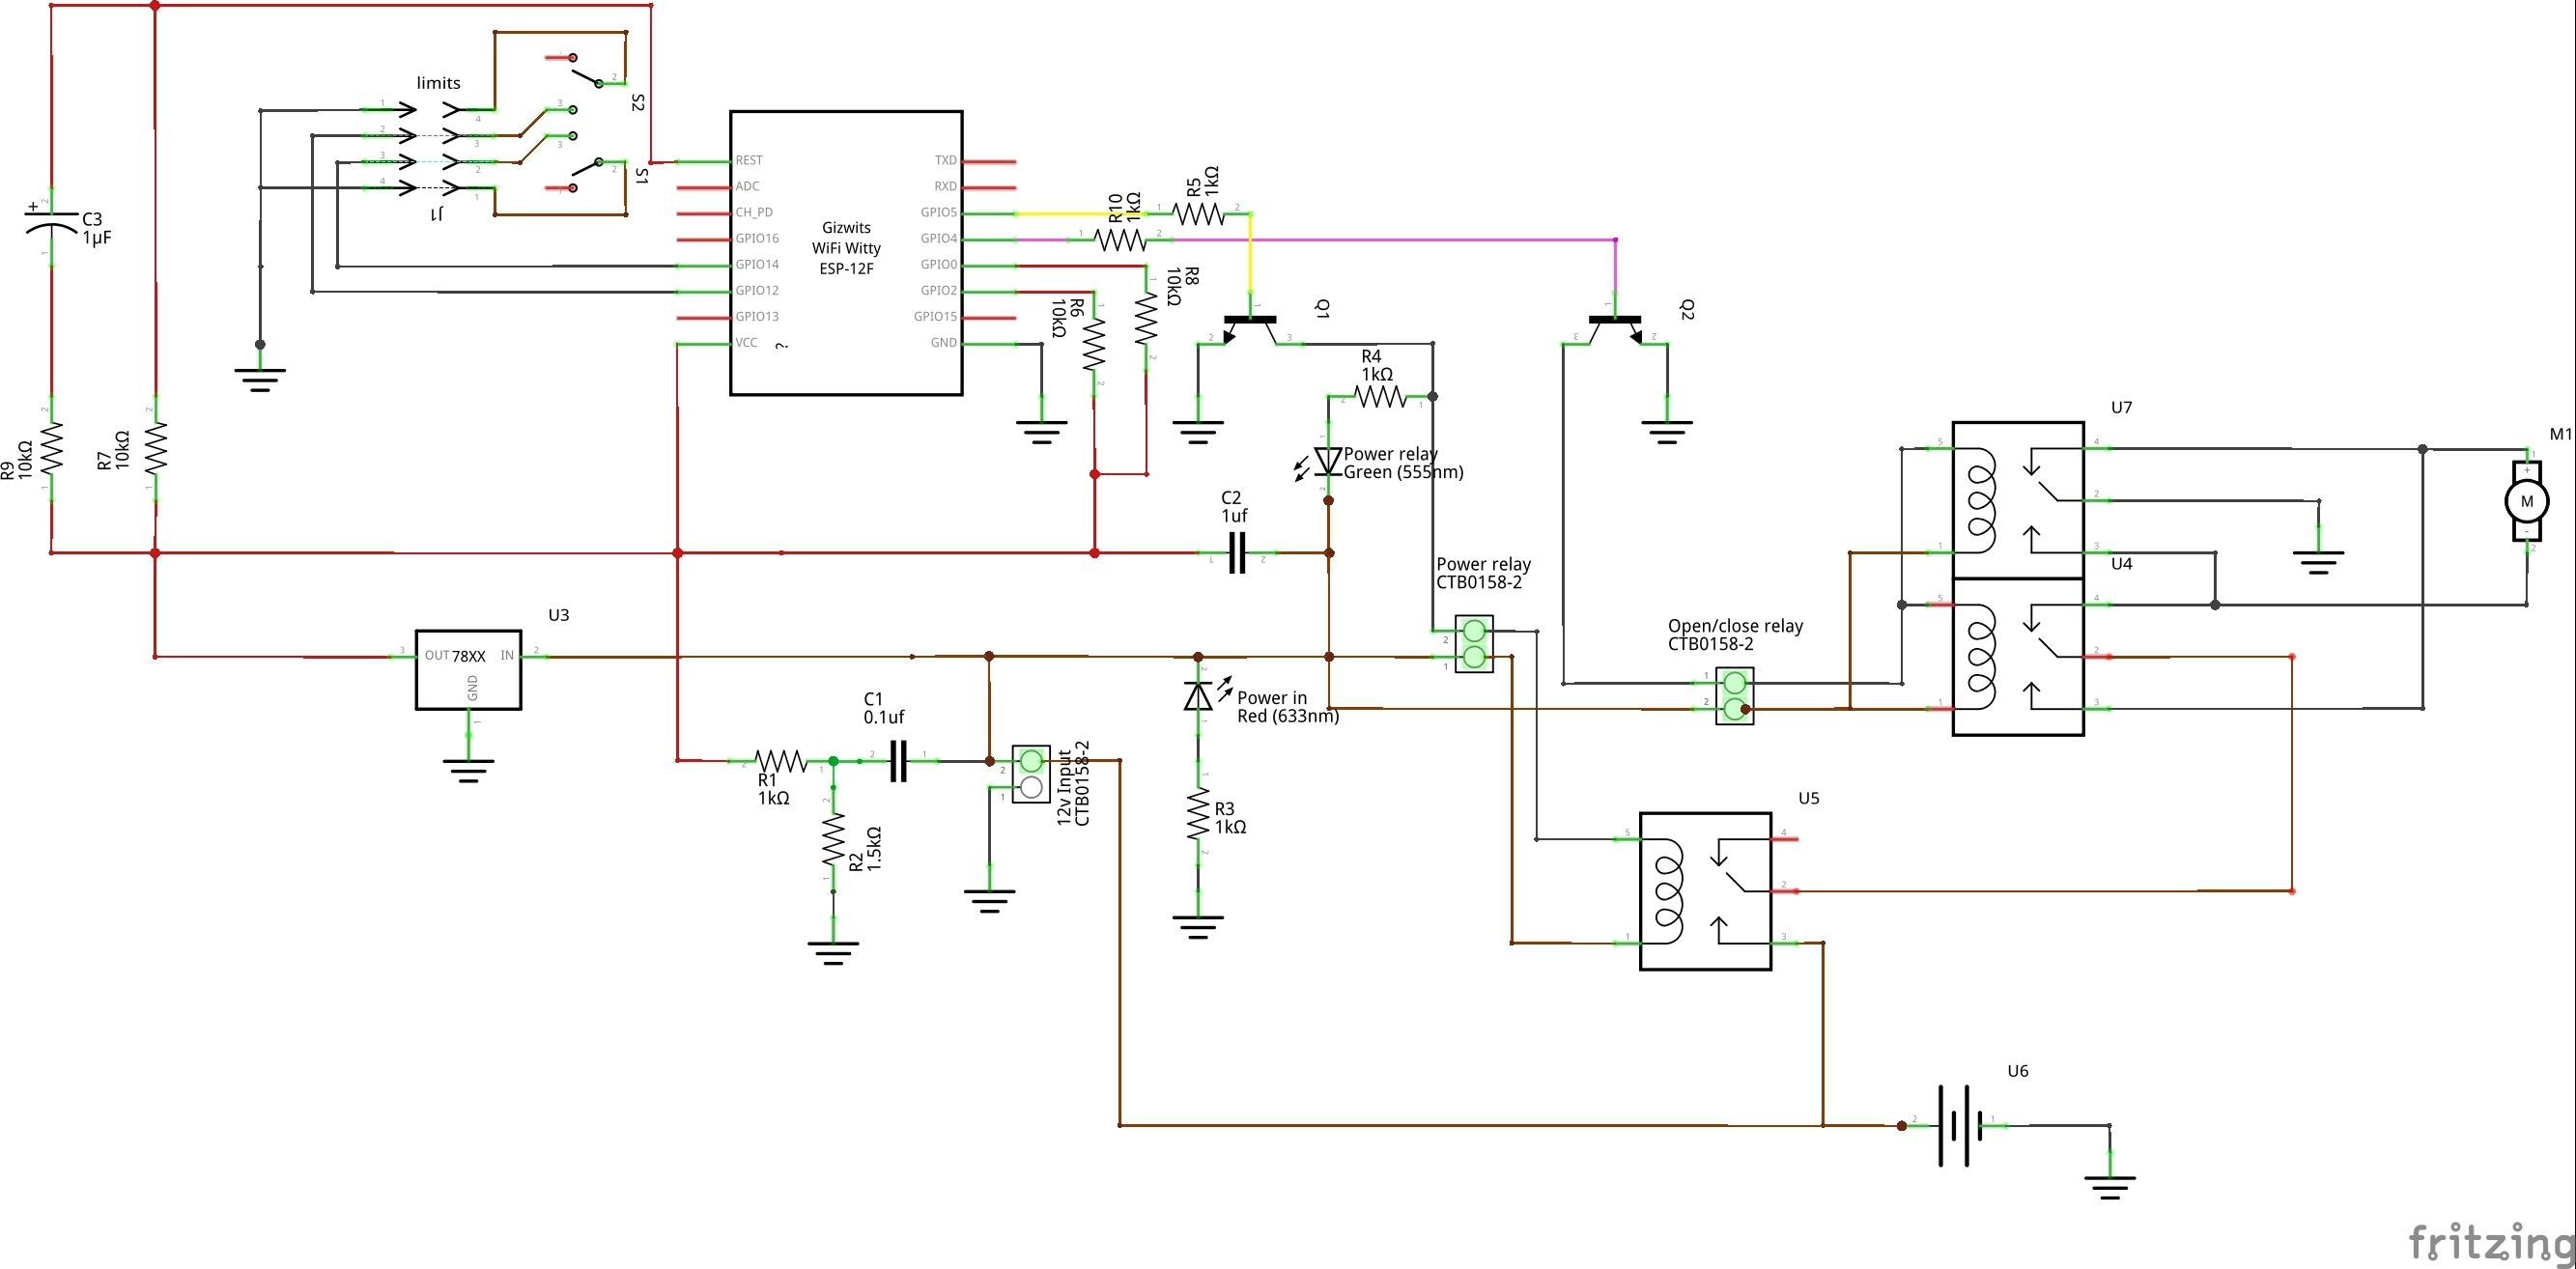 Wifi Farm Gate Controller Projects Fritzing Forum Linear Actuator Limit Switch Wiring Diagram Rec Schem2667x1314 315 Kb